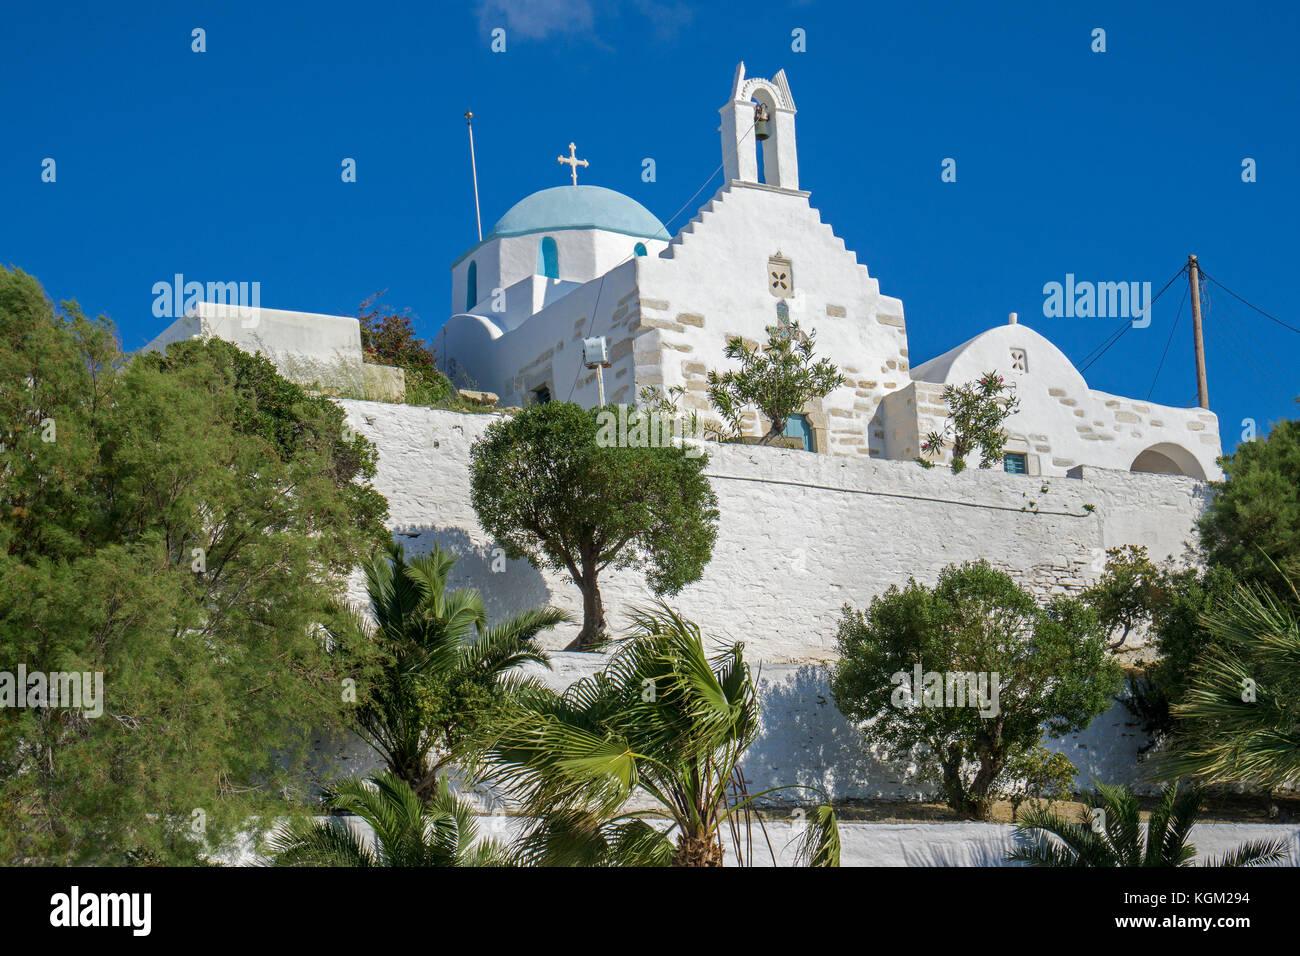 The church Agios Konstantinos at Castro quarter, Parikia, Paros island, Cyclades, Aegean, Greece - Stock Image